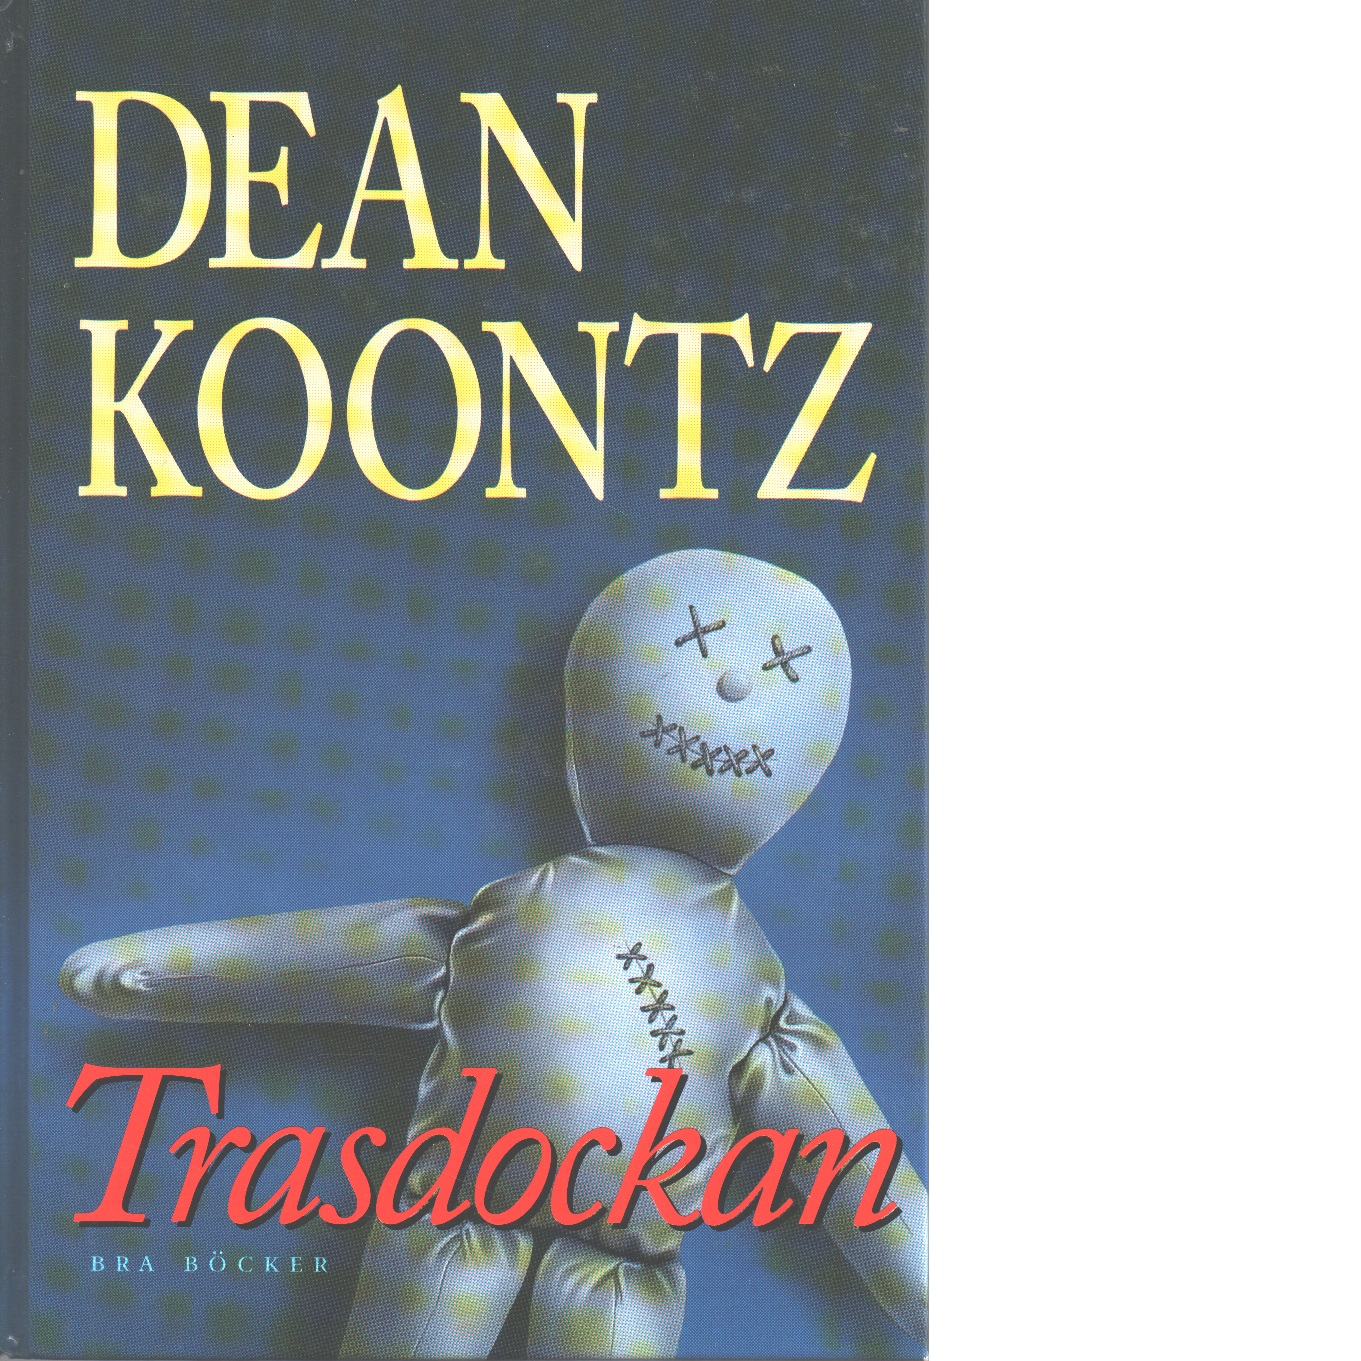 Trasdockan - Koontz, Dean R.